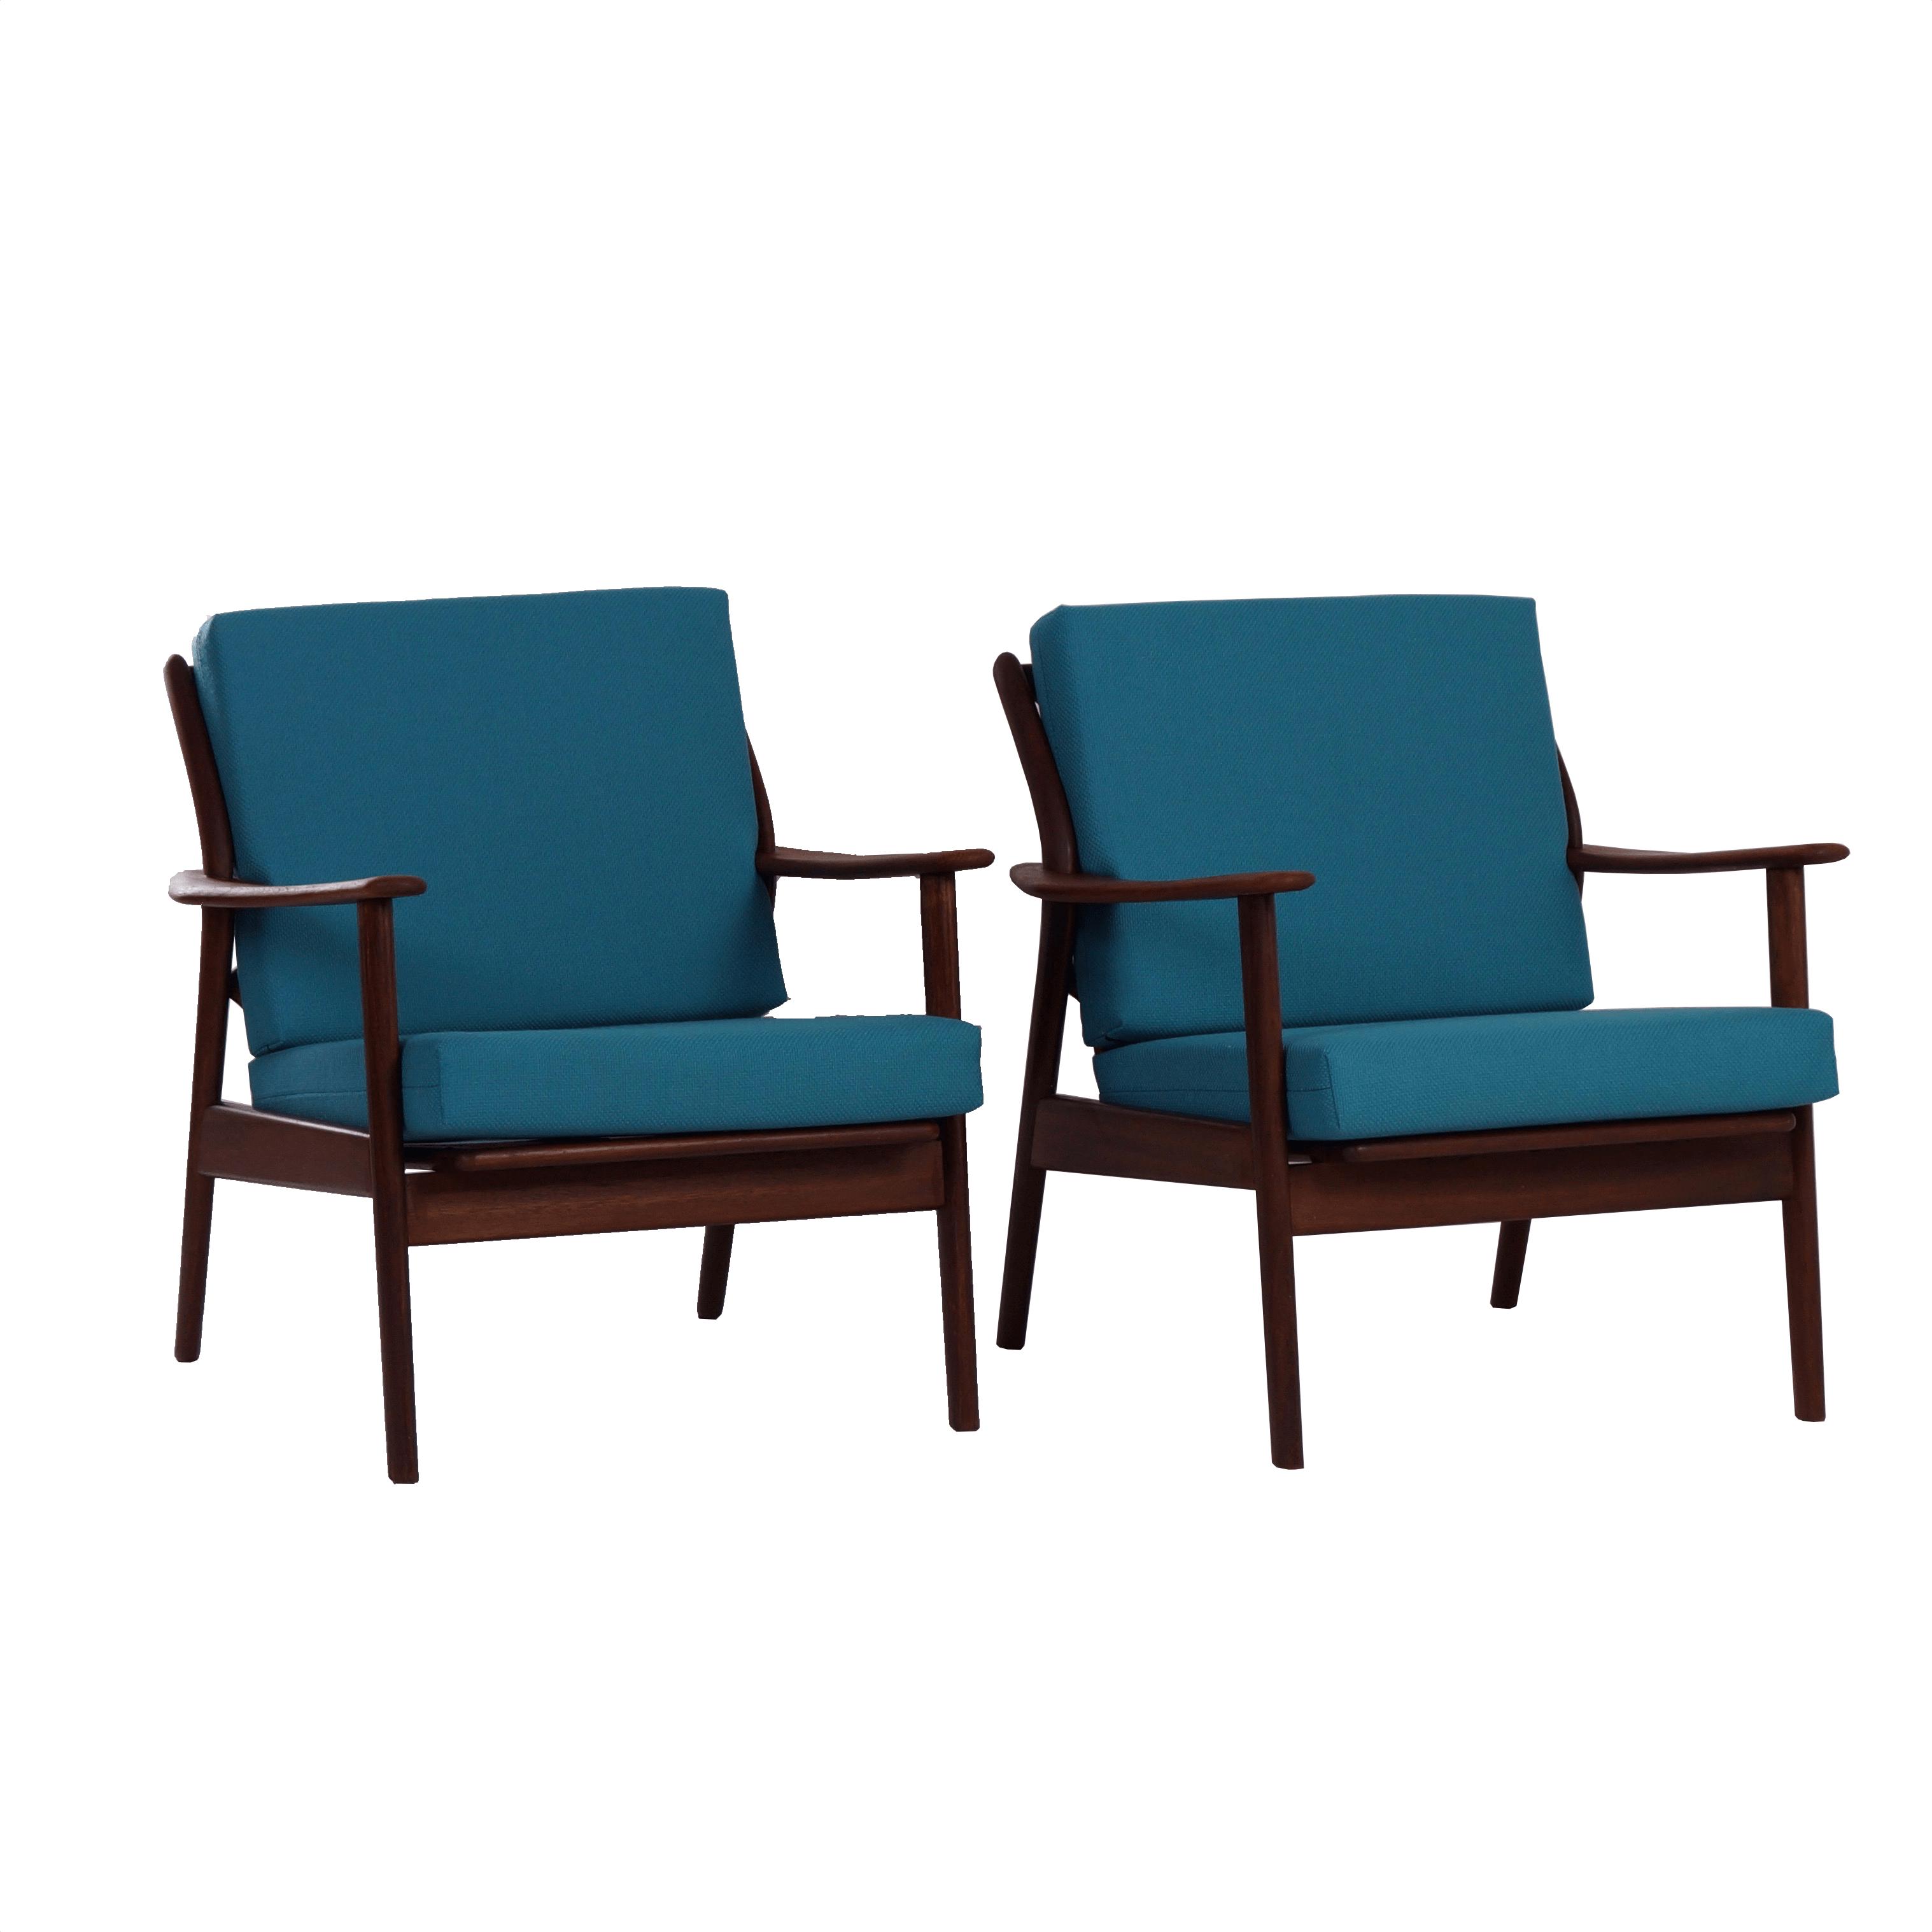 Prime Vintage Dutch Teak Easy Chairs By De Ster Gelderland 1960S Inzonedesignstudio Interior Chair Design Inzonedesignstudiocom